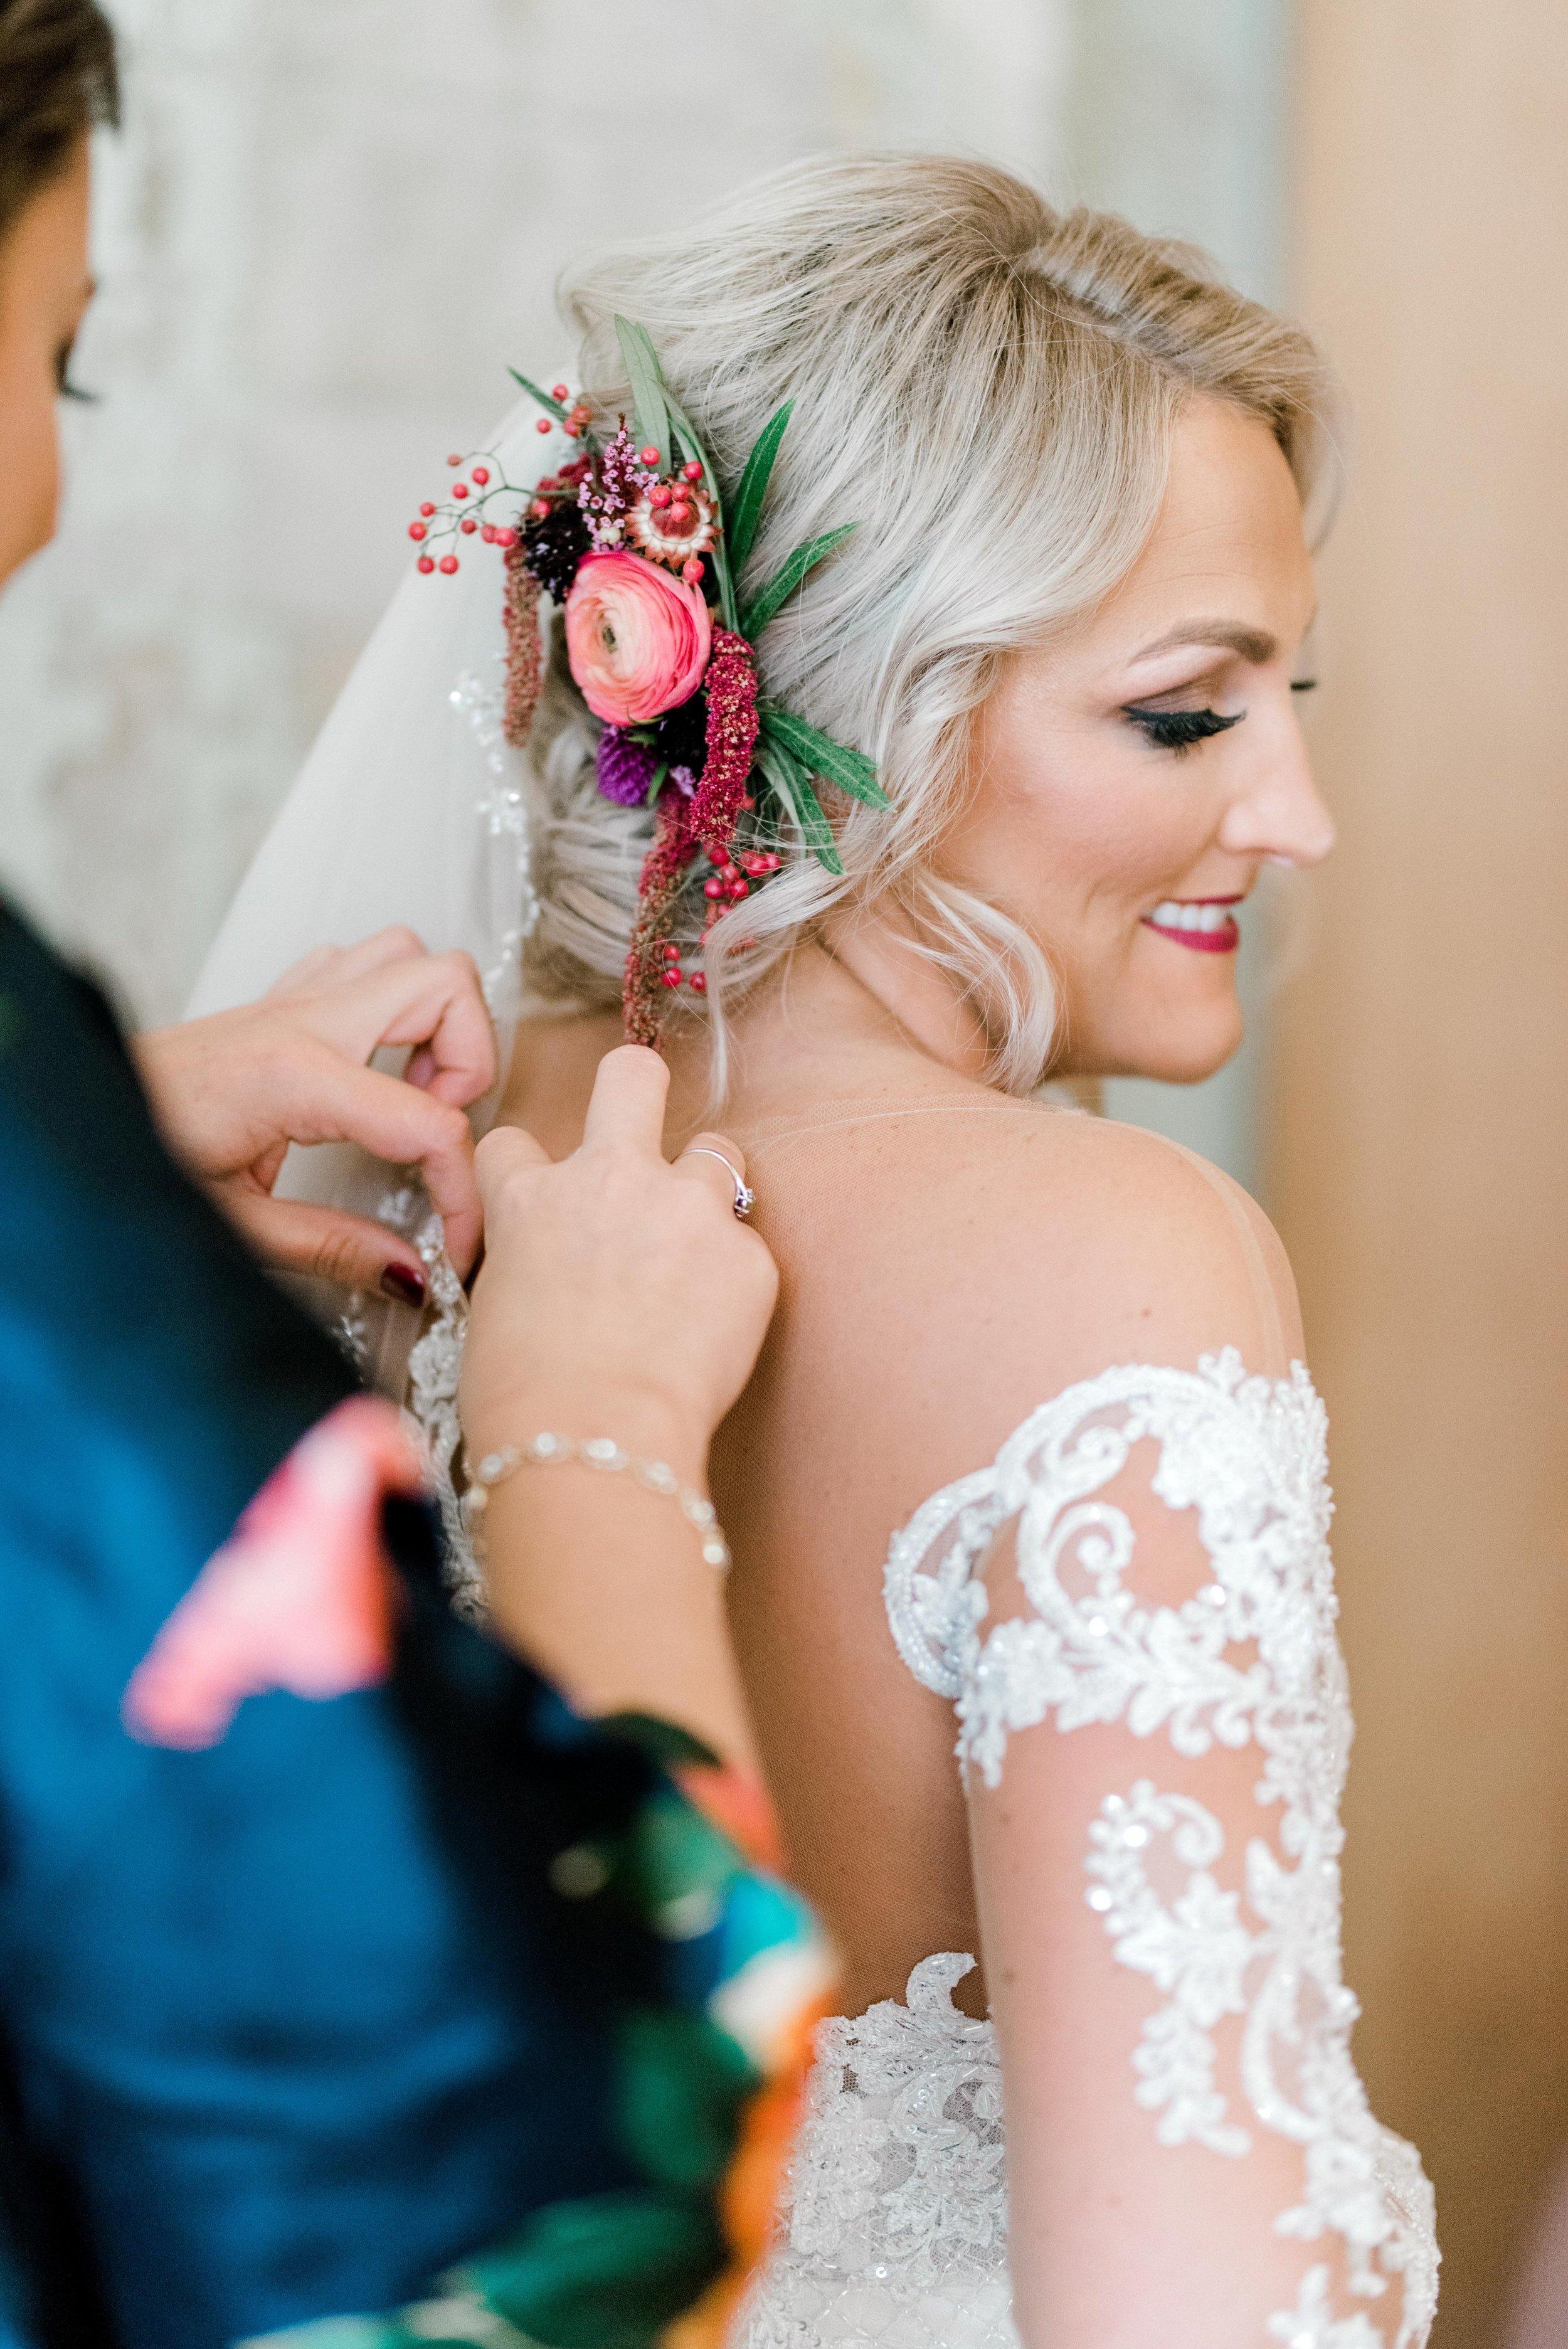 Ryan Alexa Married-Getting Ready First Look-0075.jpg